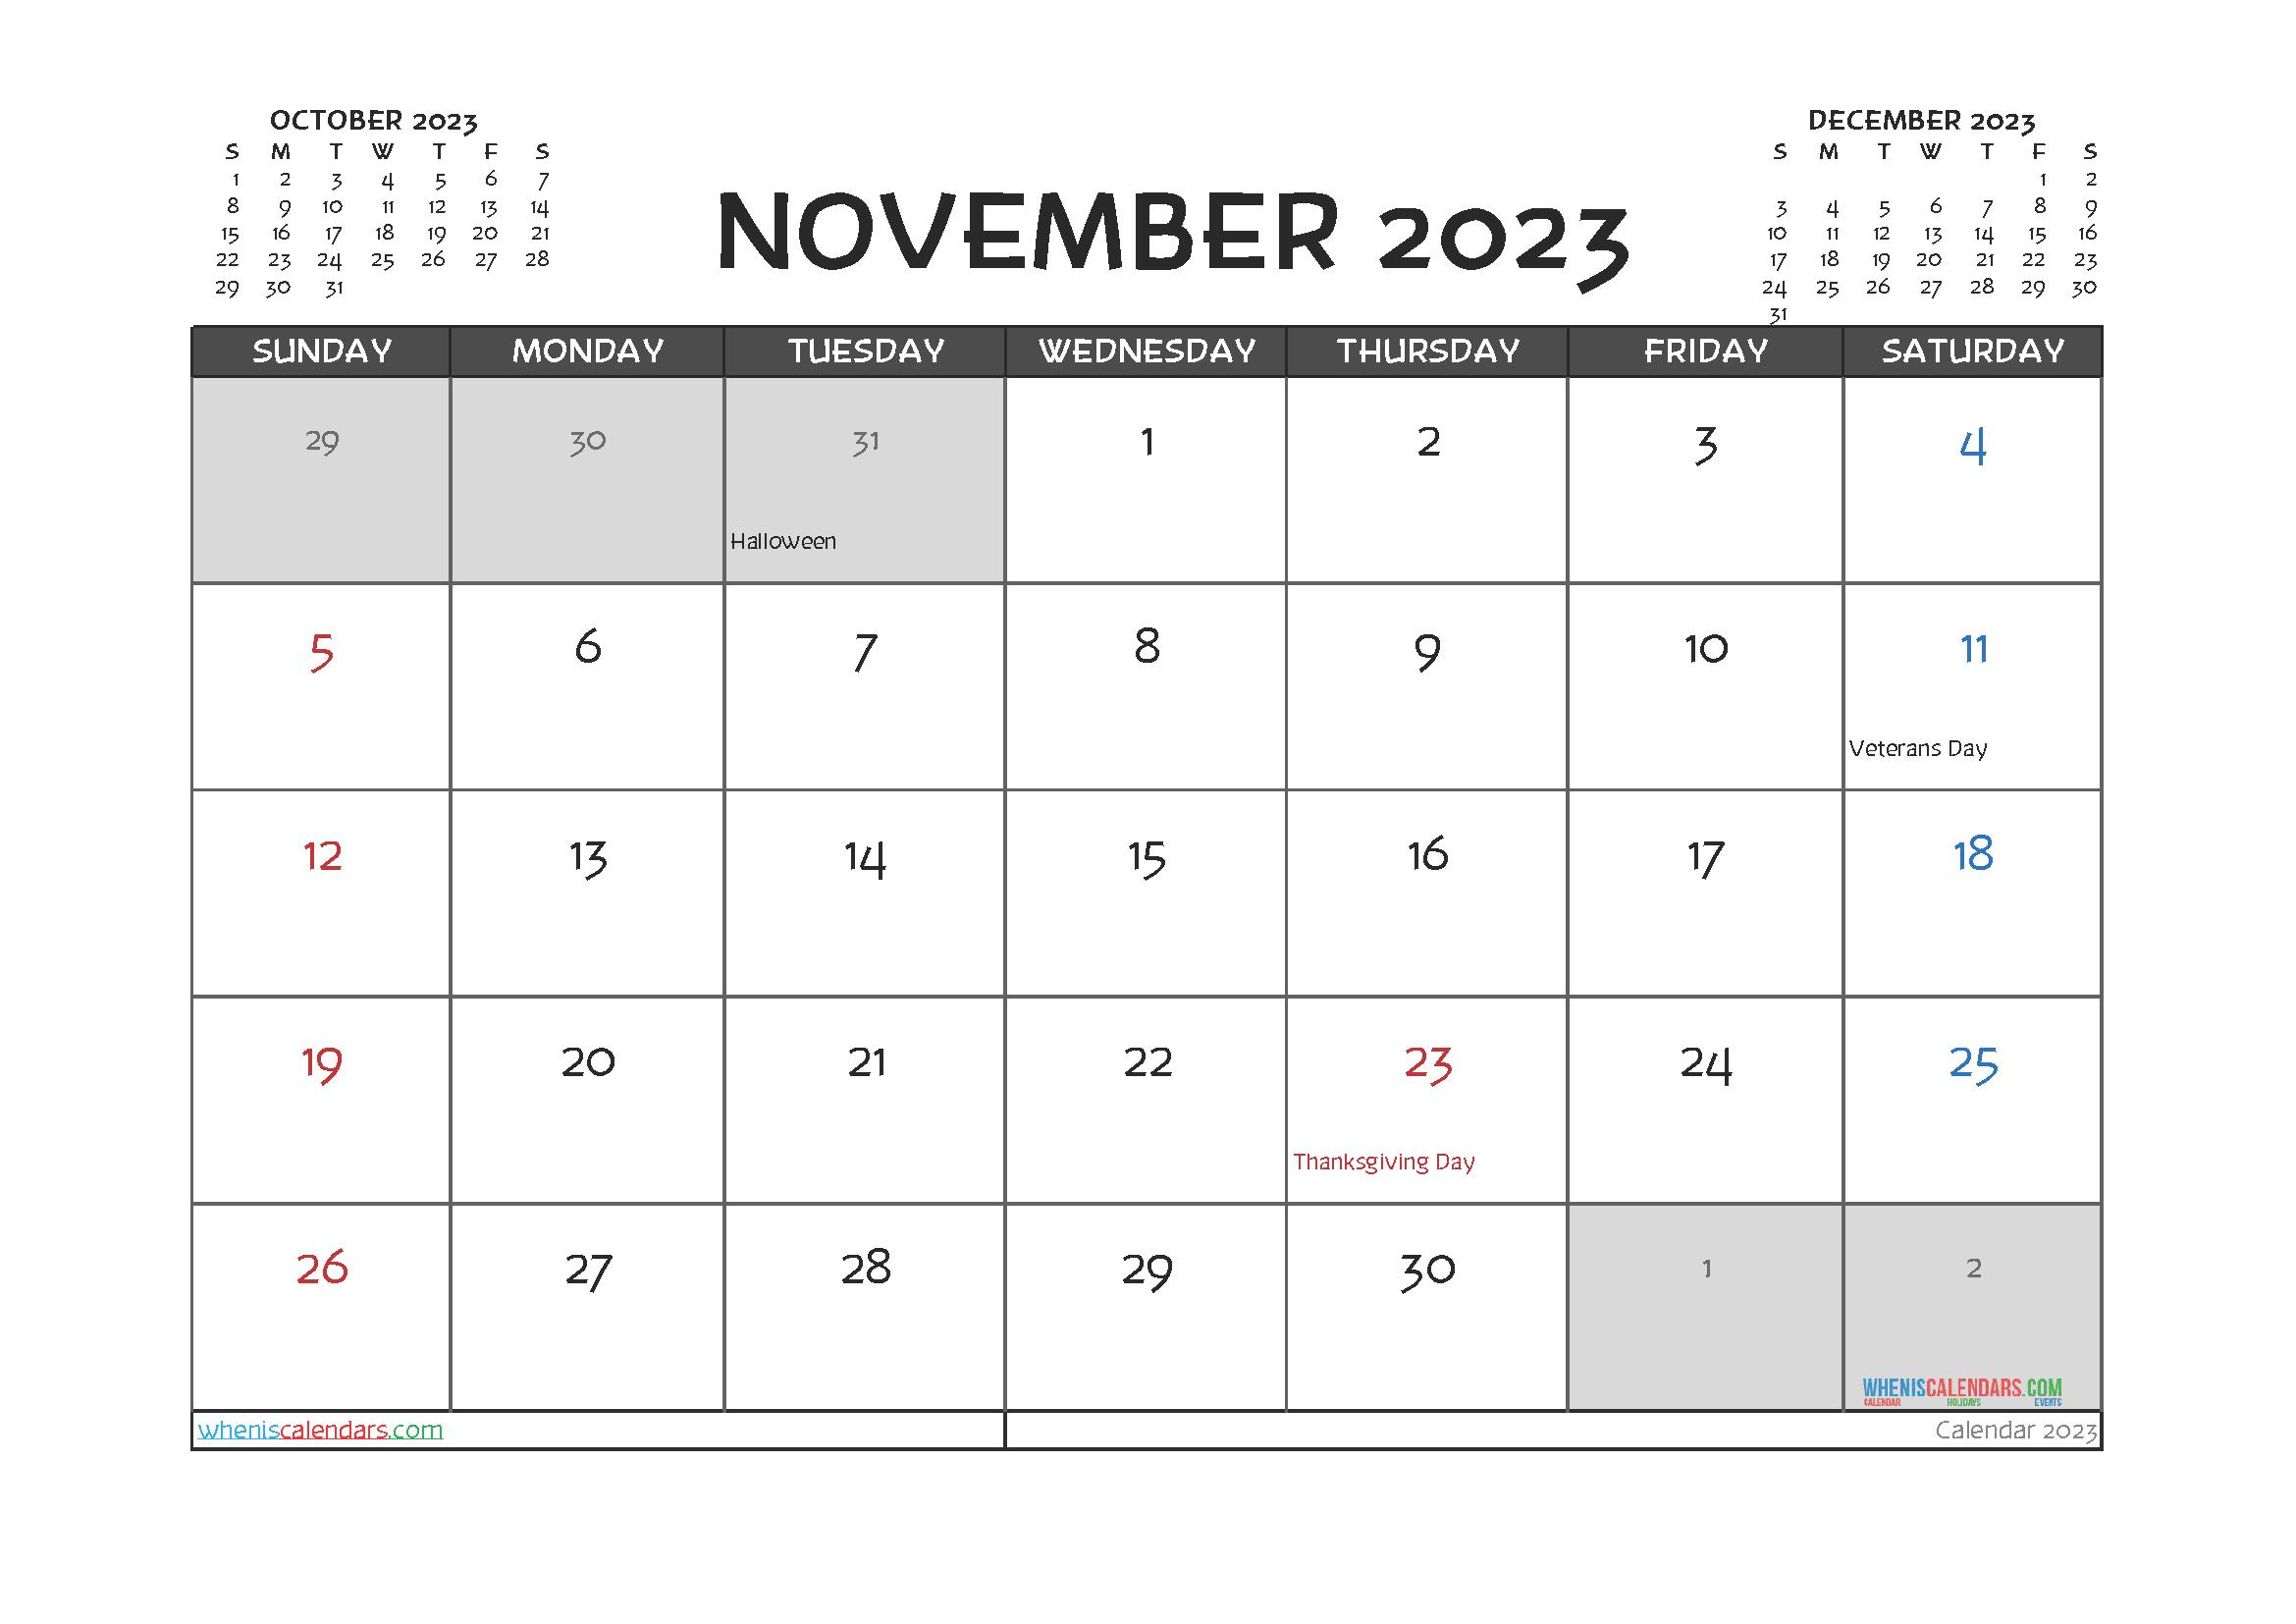 November 2023 Calendar Printable For Free